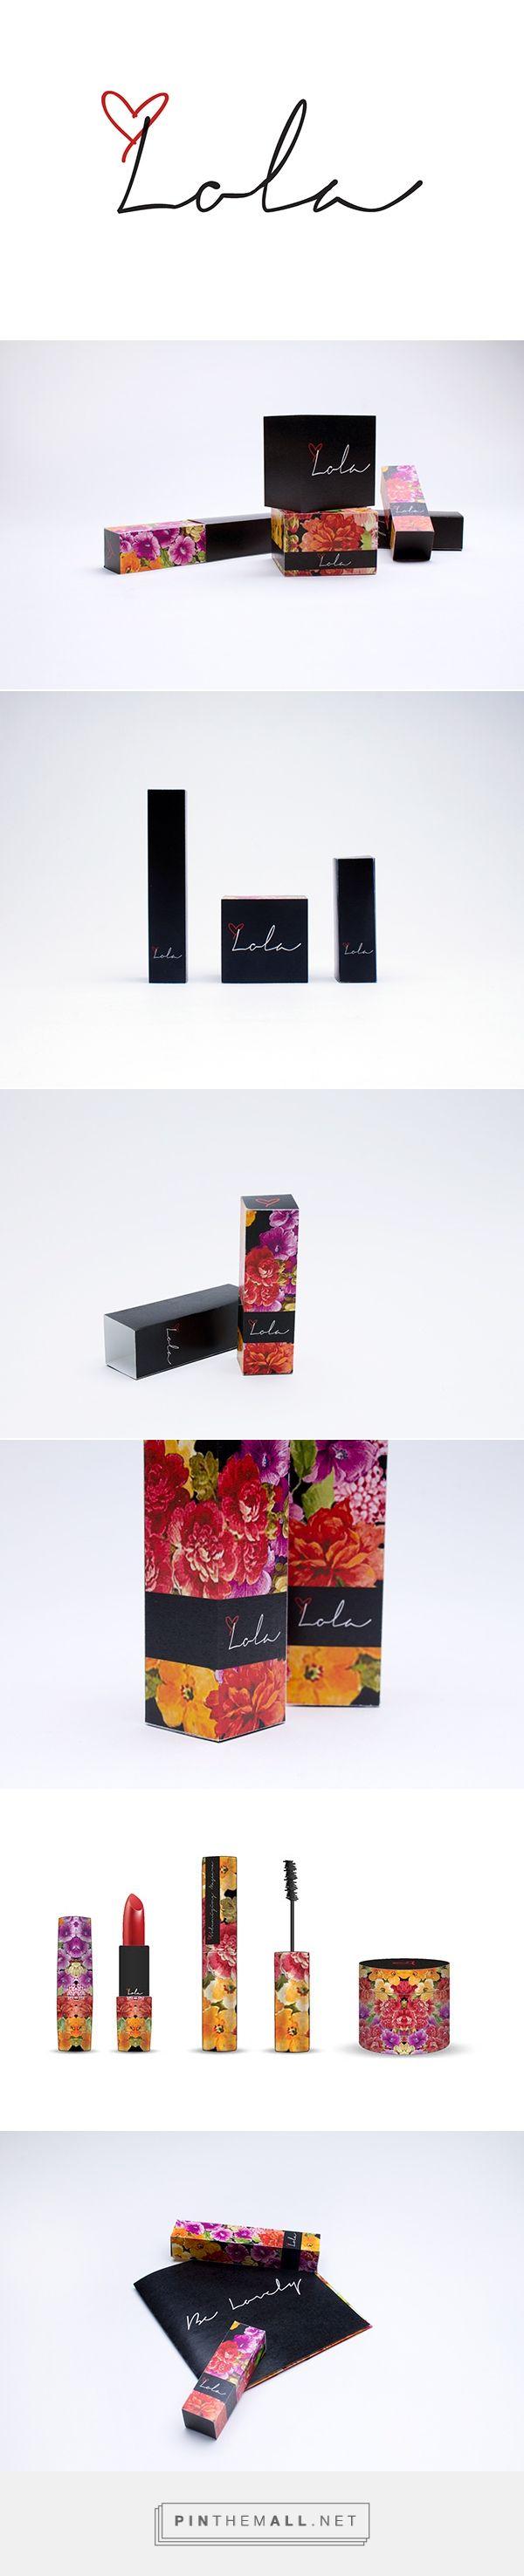 Lola Cosmetics Packaging by Meghan Larimer on Behance | Fivestar Branding – Design and Branding Agency & Inspiration Gallery